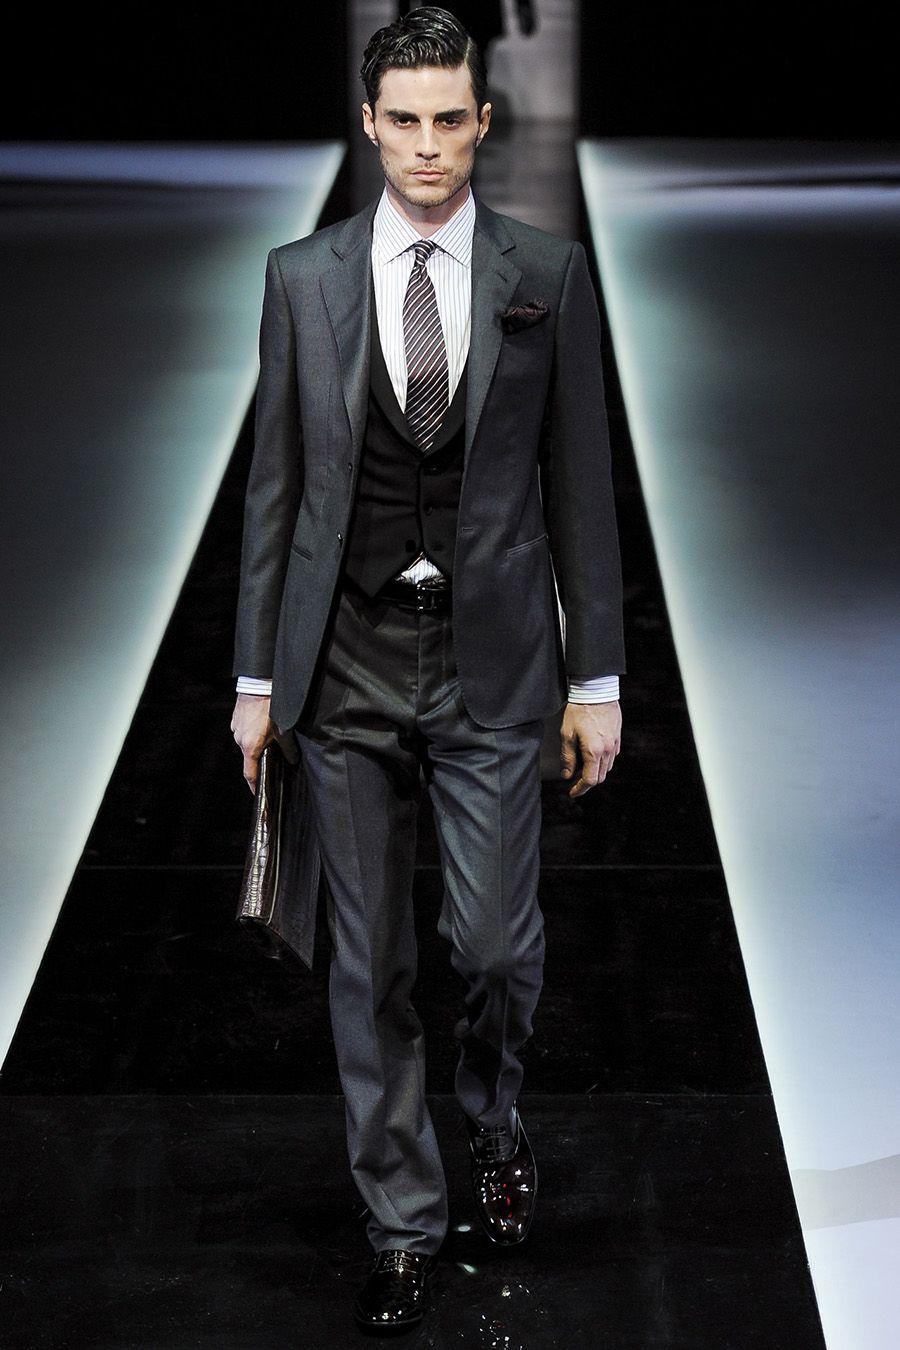 giorgio armani suit rylands 2014 vision board